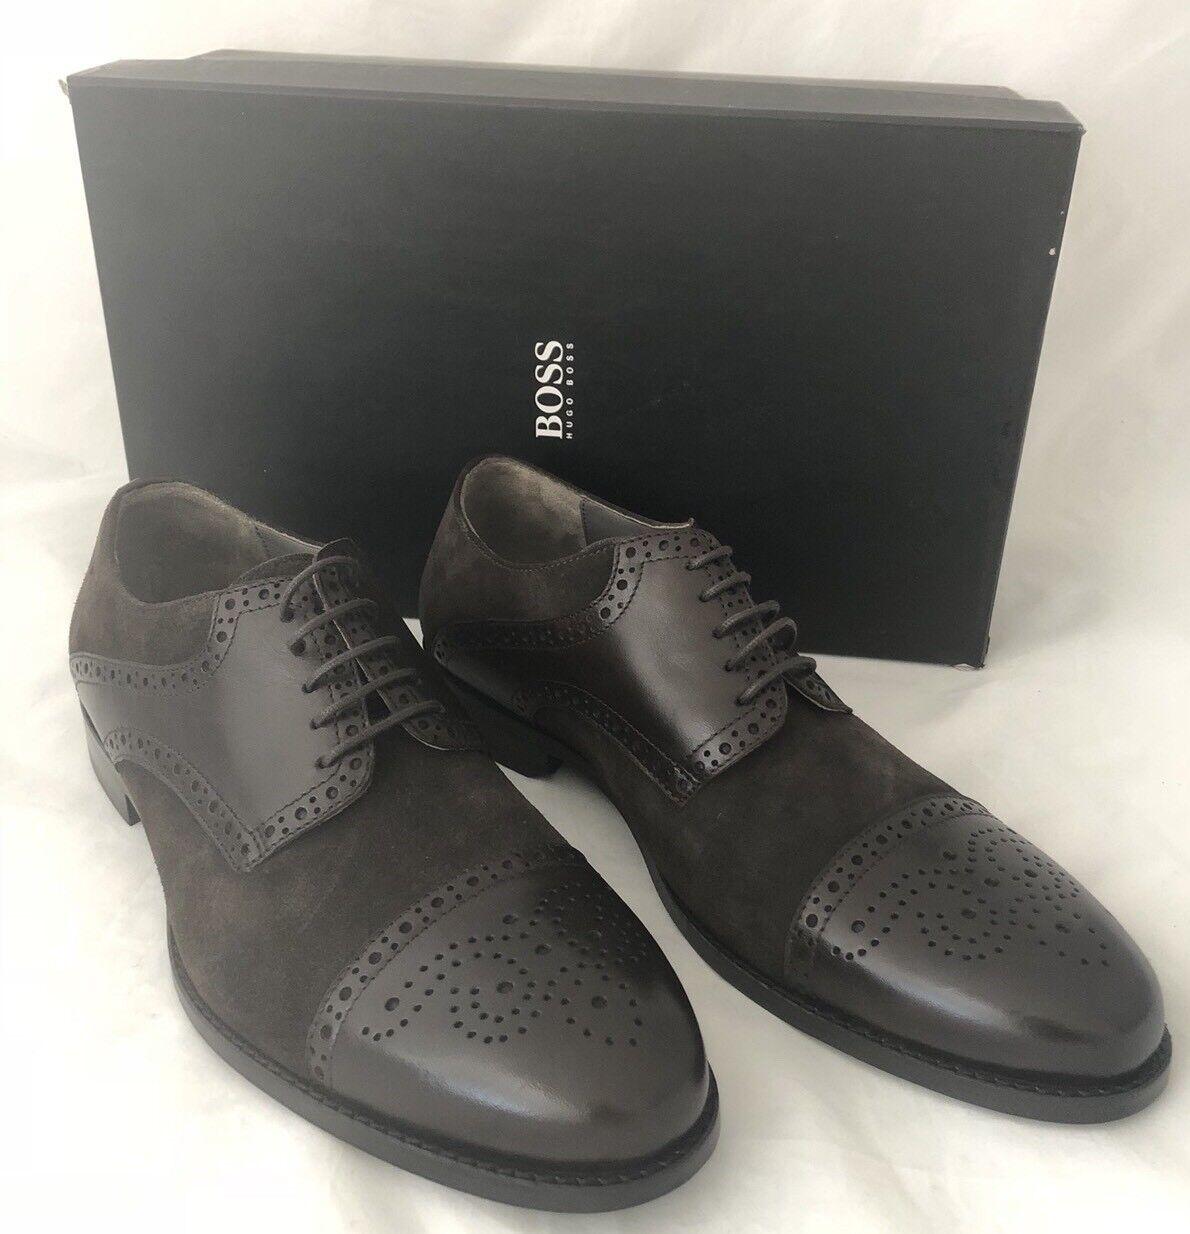 NIB 245 Boss Hugo Boss Suede/Leather Men's C-Gramix Shoes Brown 8.5 US 50299506